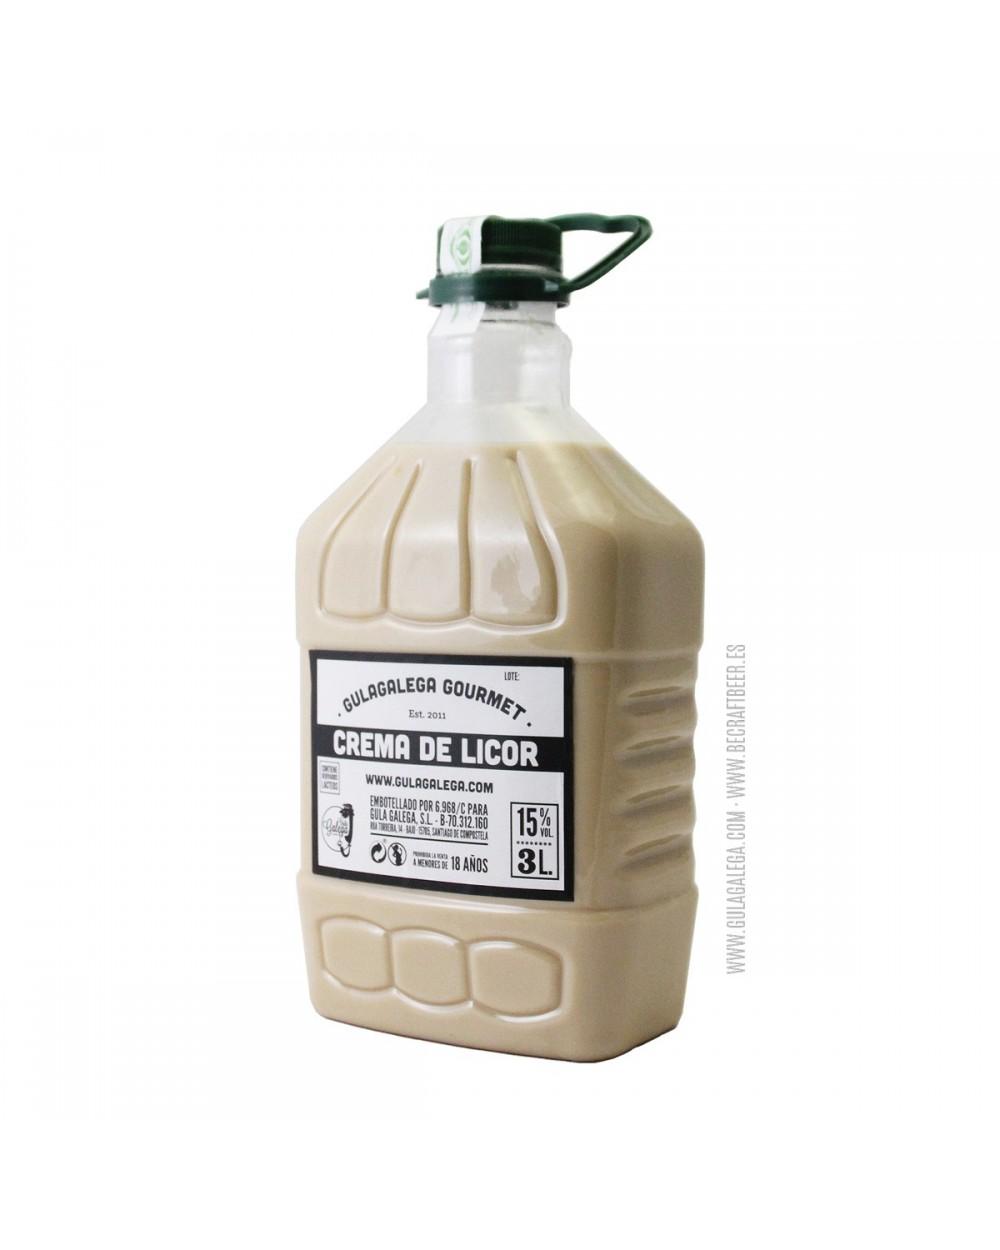 Crema de Licor GULAGALEGA GOURMET 3 Litros